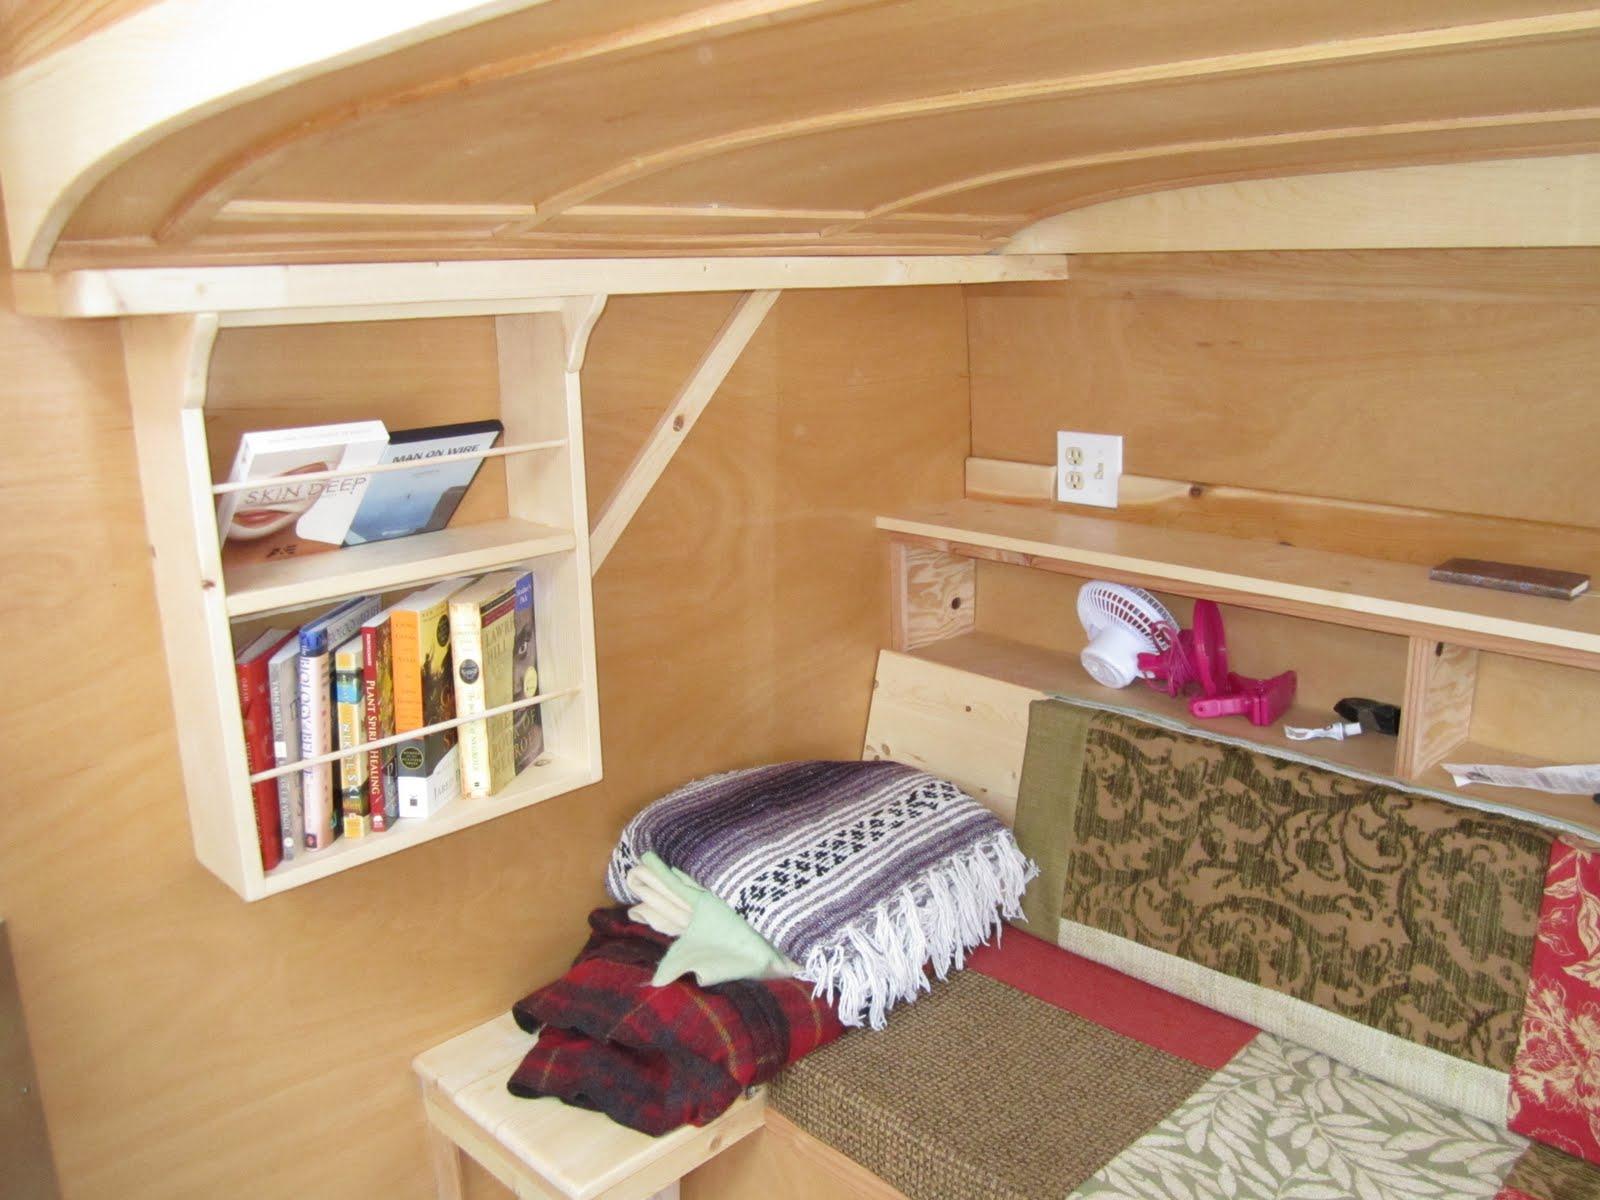 Tiny home teardrop trailer more interior photos for Teardrop camper interior ideas